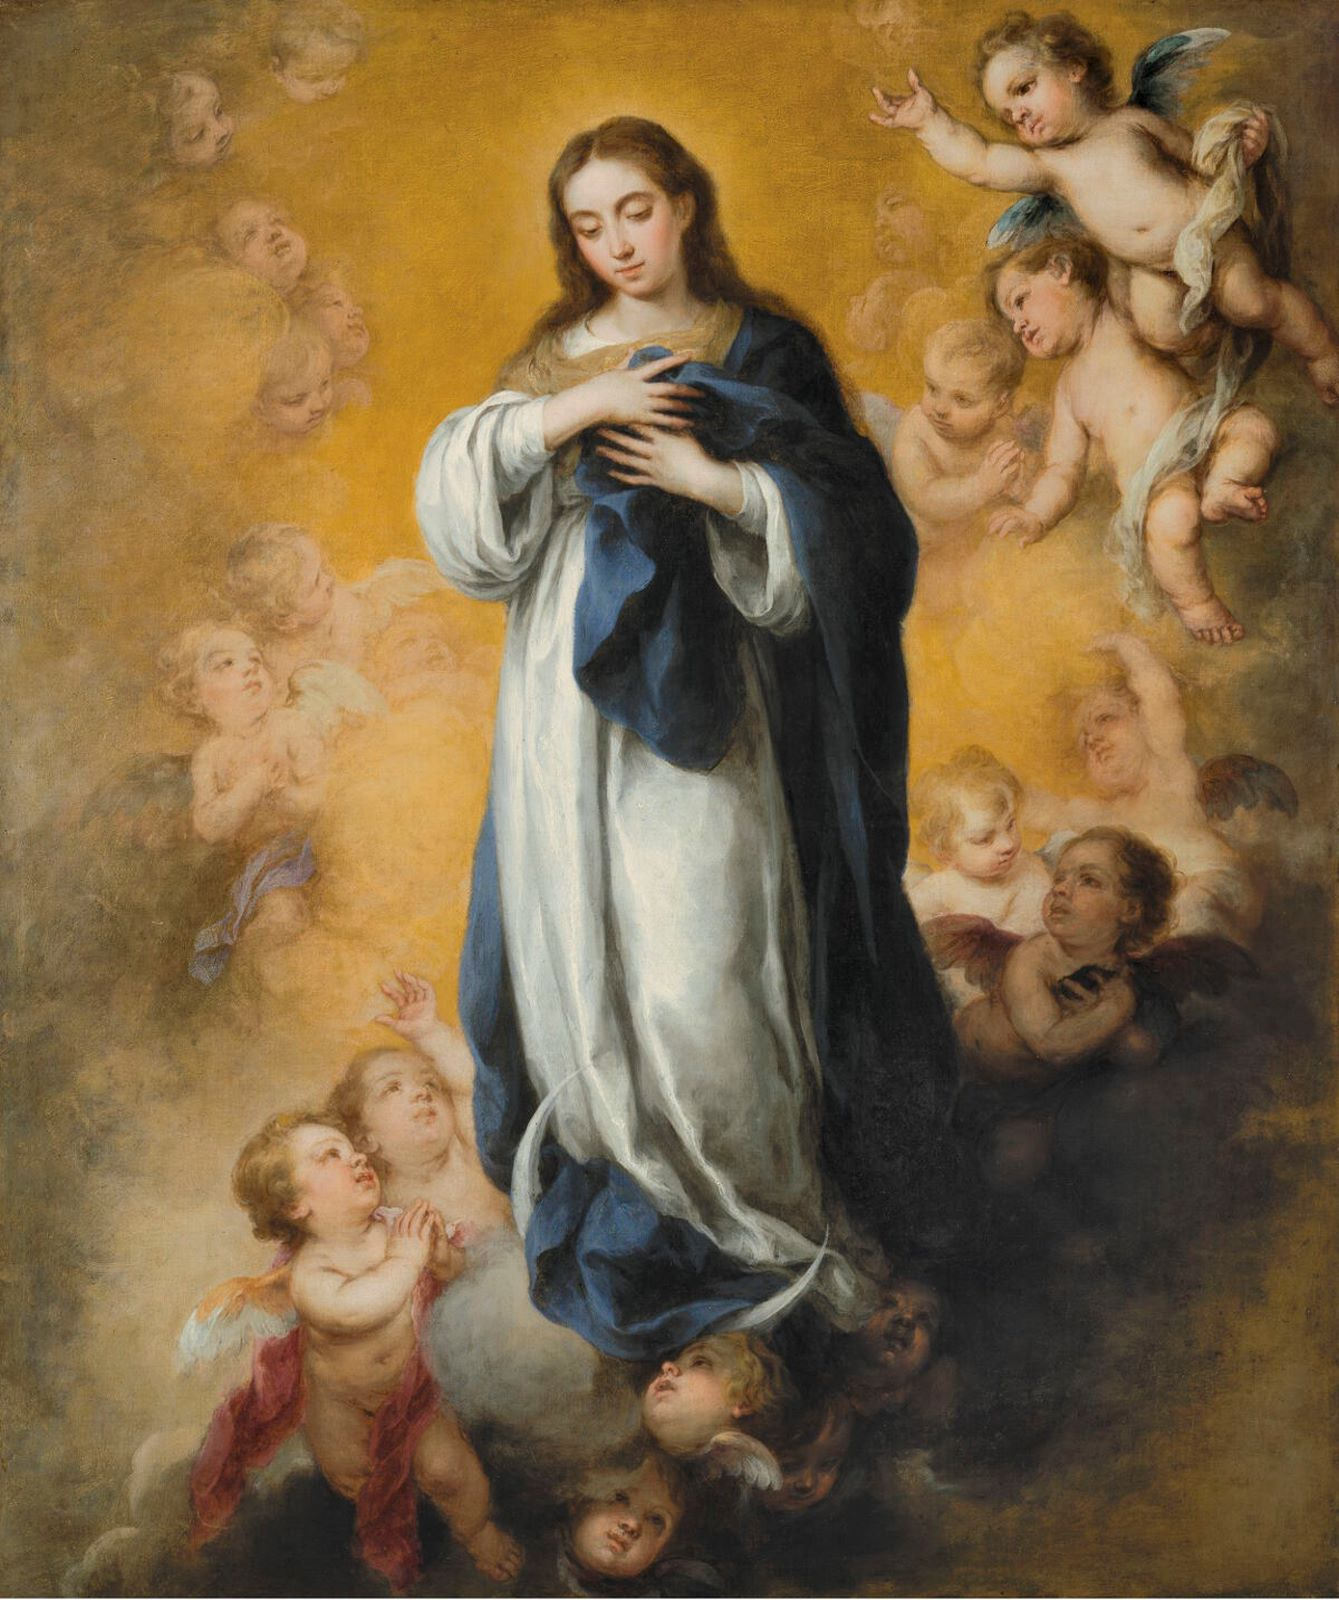 Murillo y la inmaculada concepci n ii aznalfarache for Sala 7 concepcion